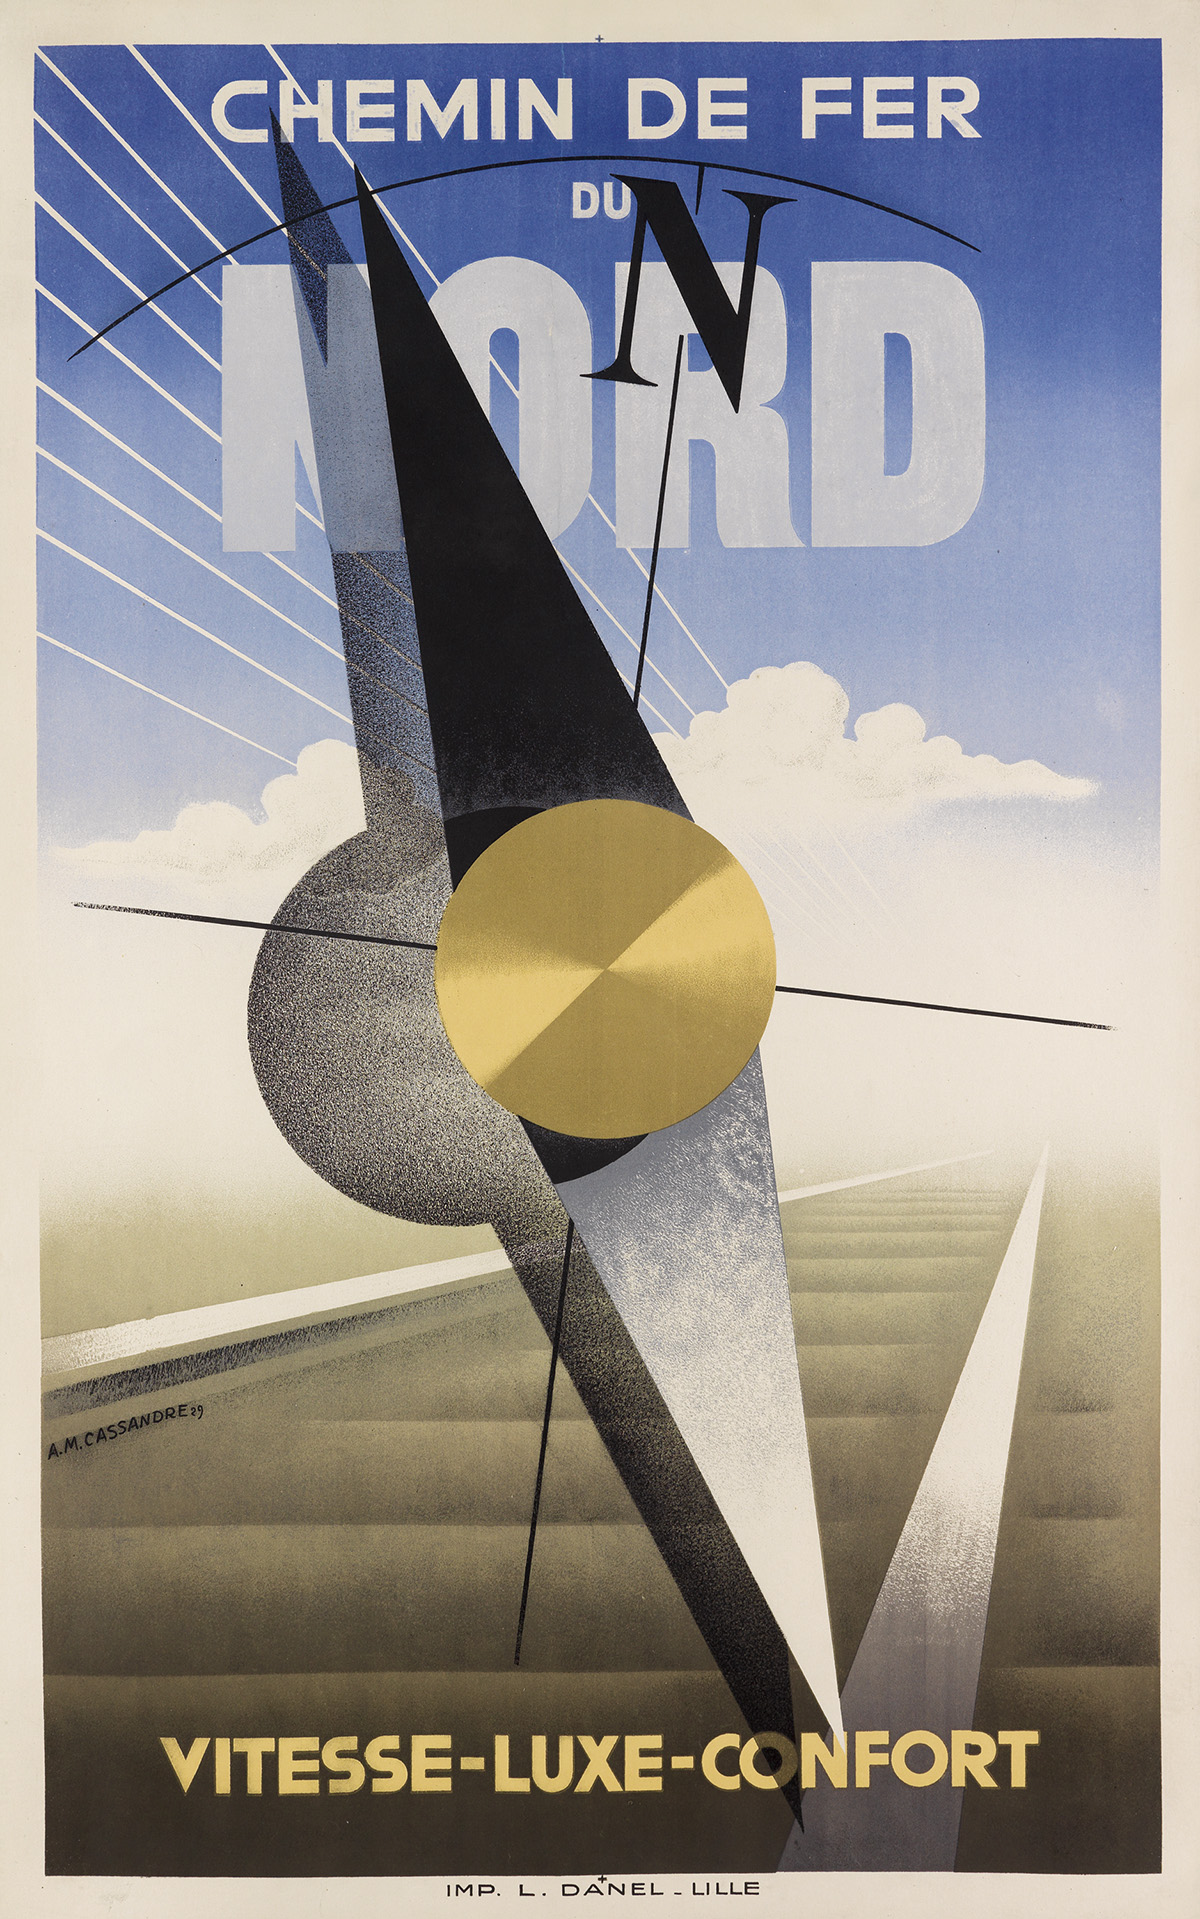 ADOLPHE-MOURON-CASSANDRE-(1901-1968)-CHEMIN-DE-FER-DU-NORD-1